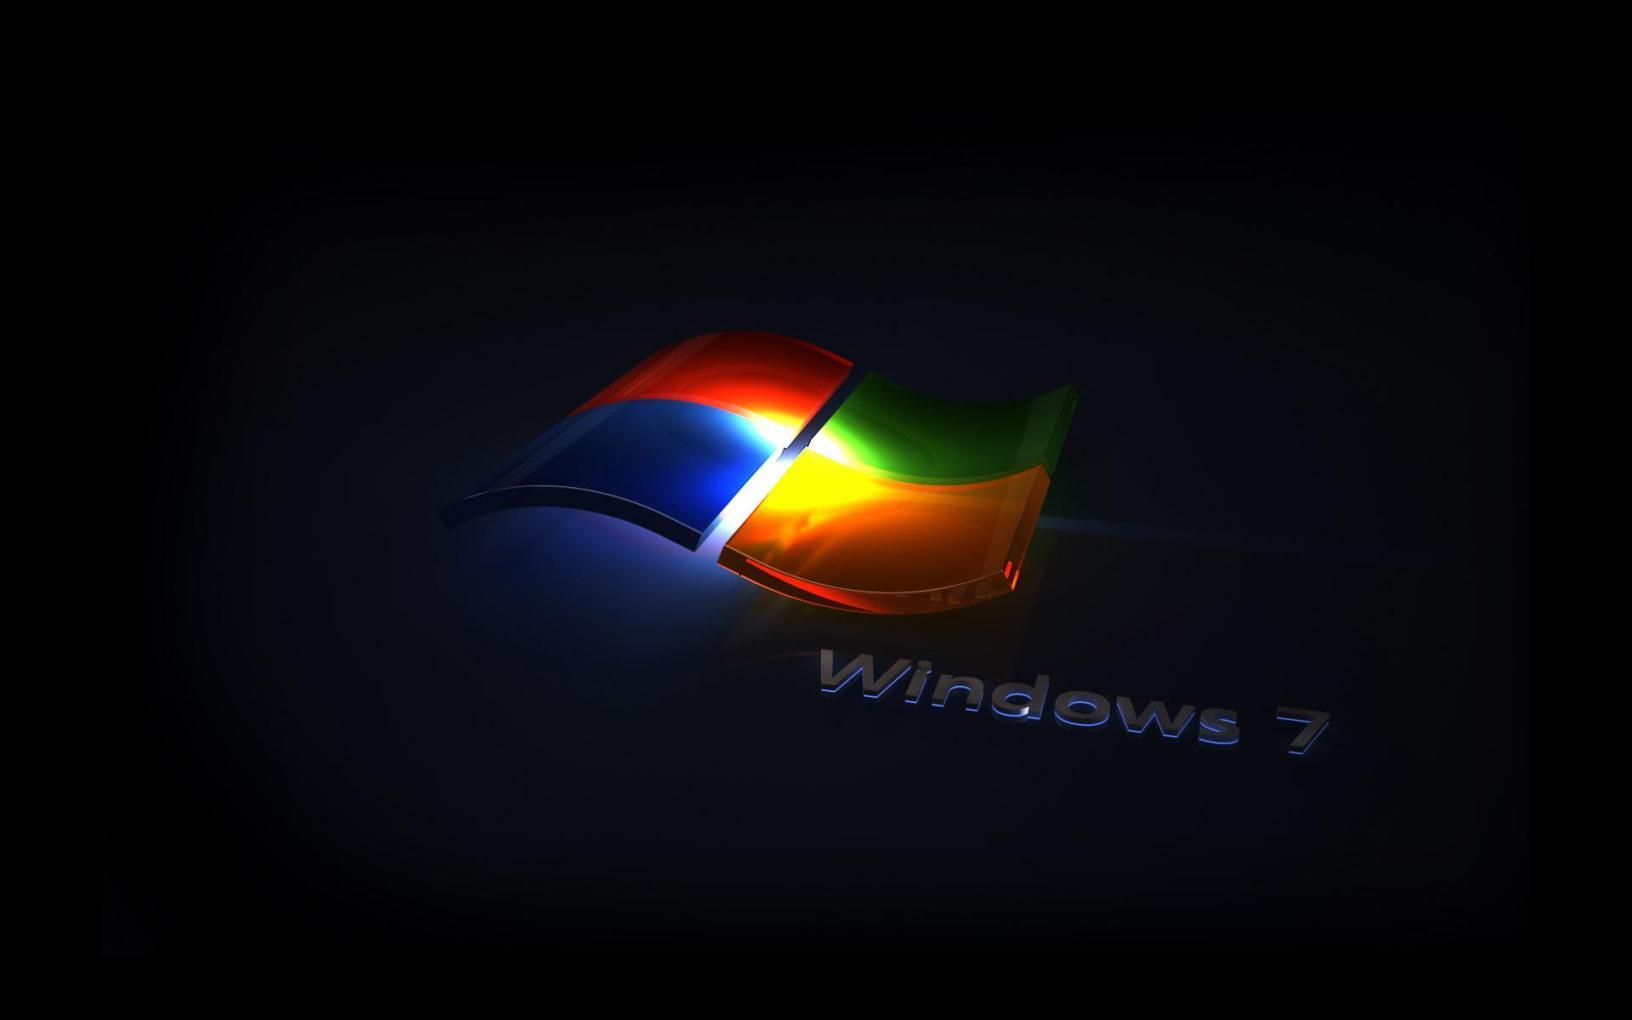 Sfondi E Wallpaper Windows 7 Full Hd Gratis